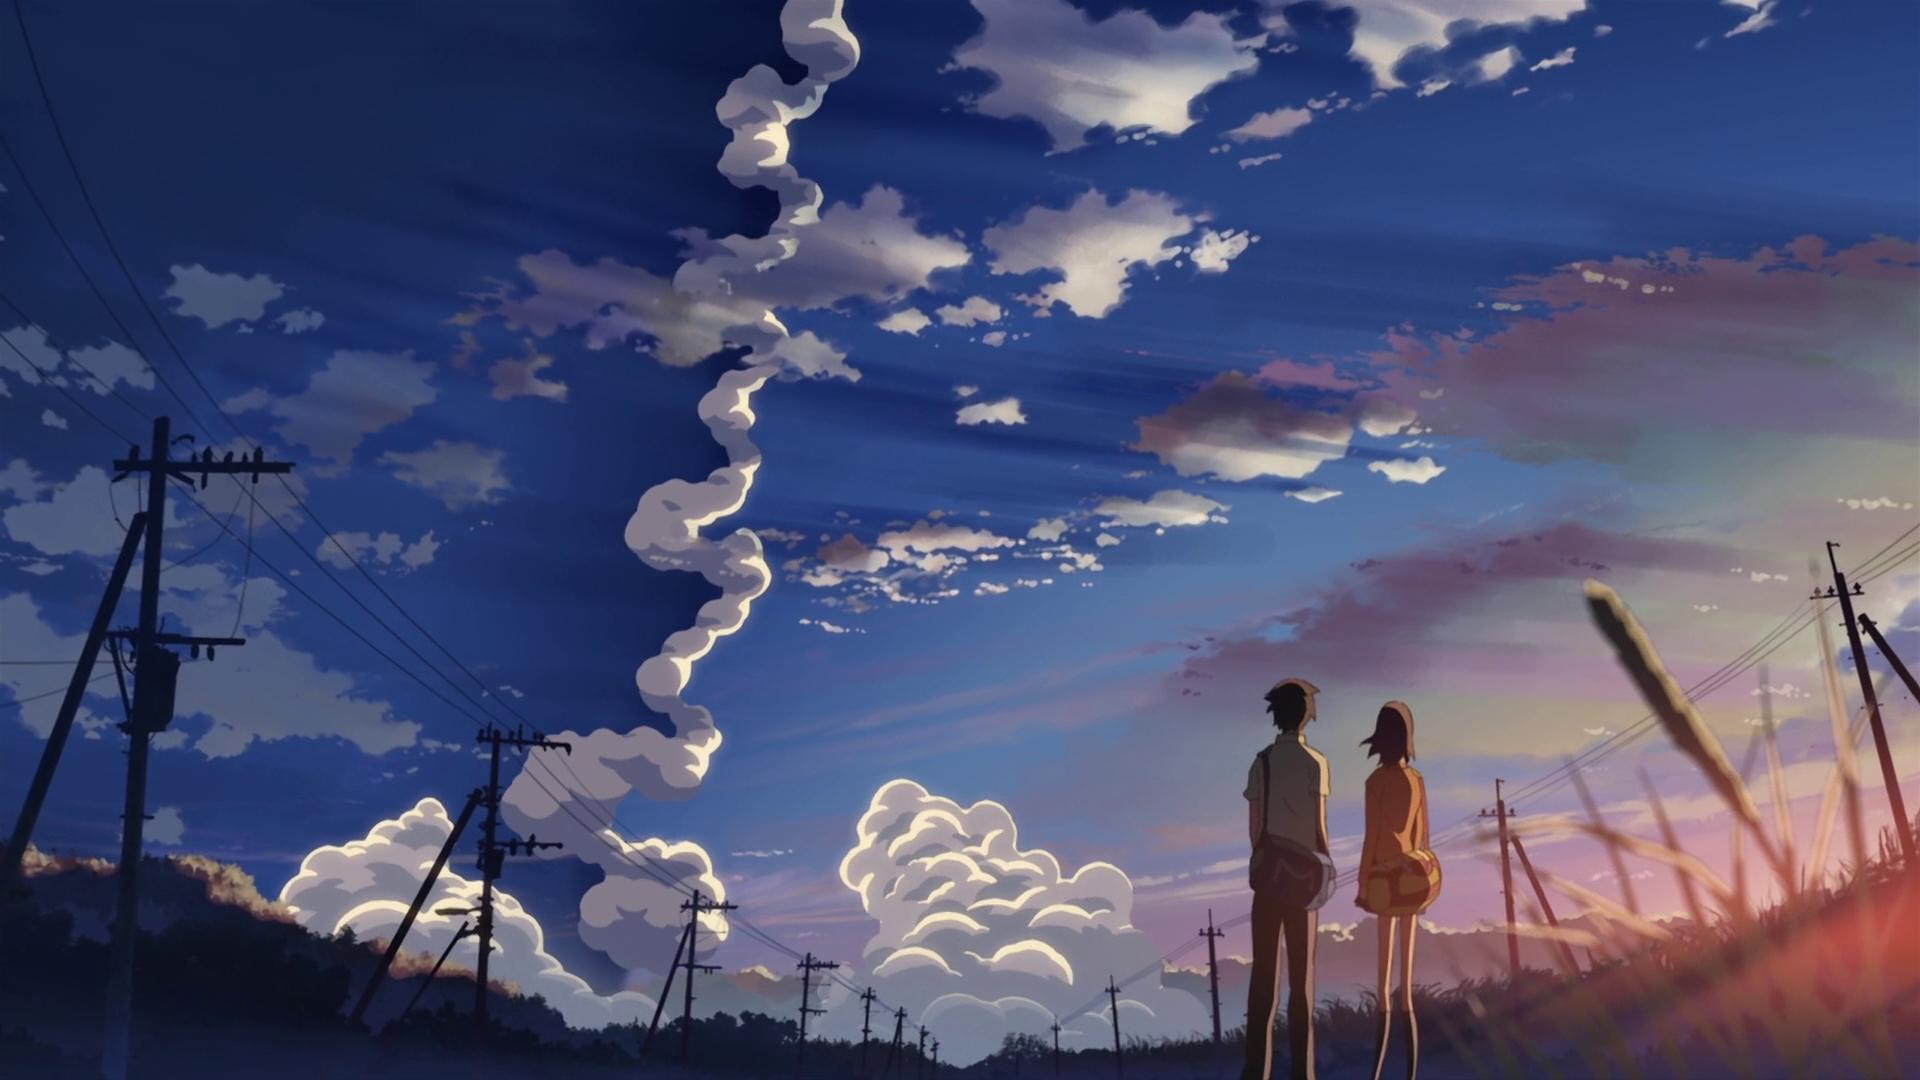 a thousand lives lived anime review 5 cm per second